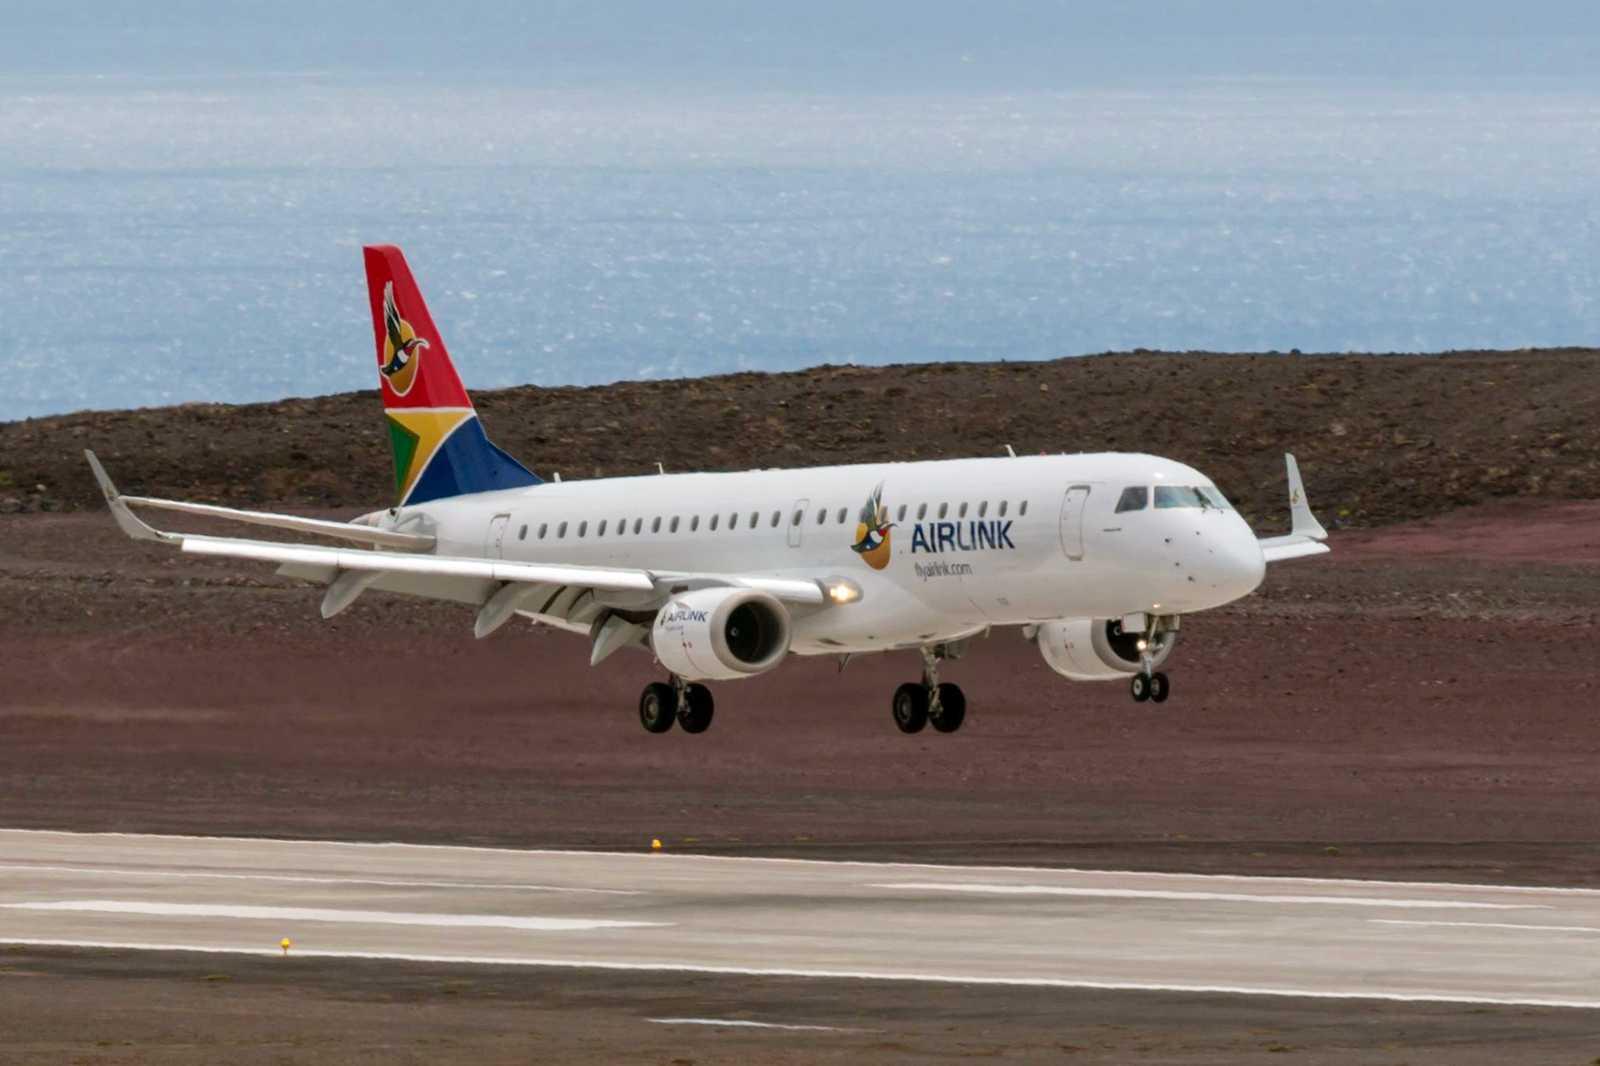 Resultado de imagen para Airlink Windhoek St. Elena